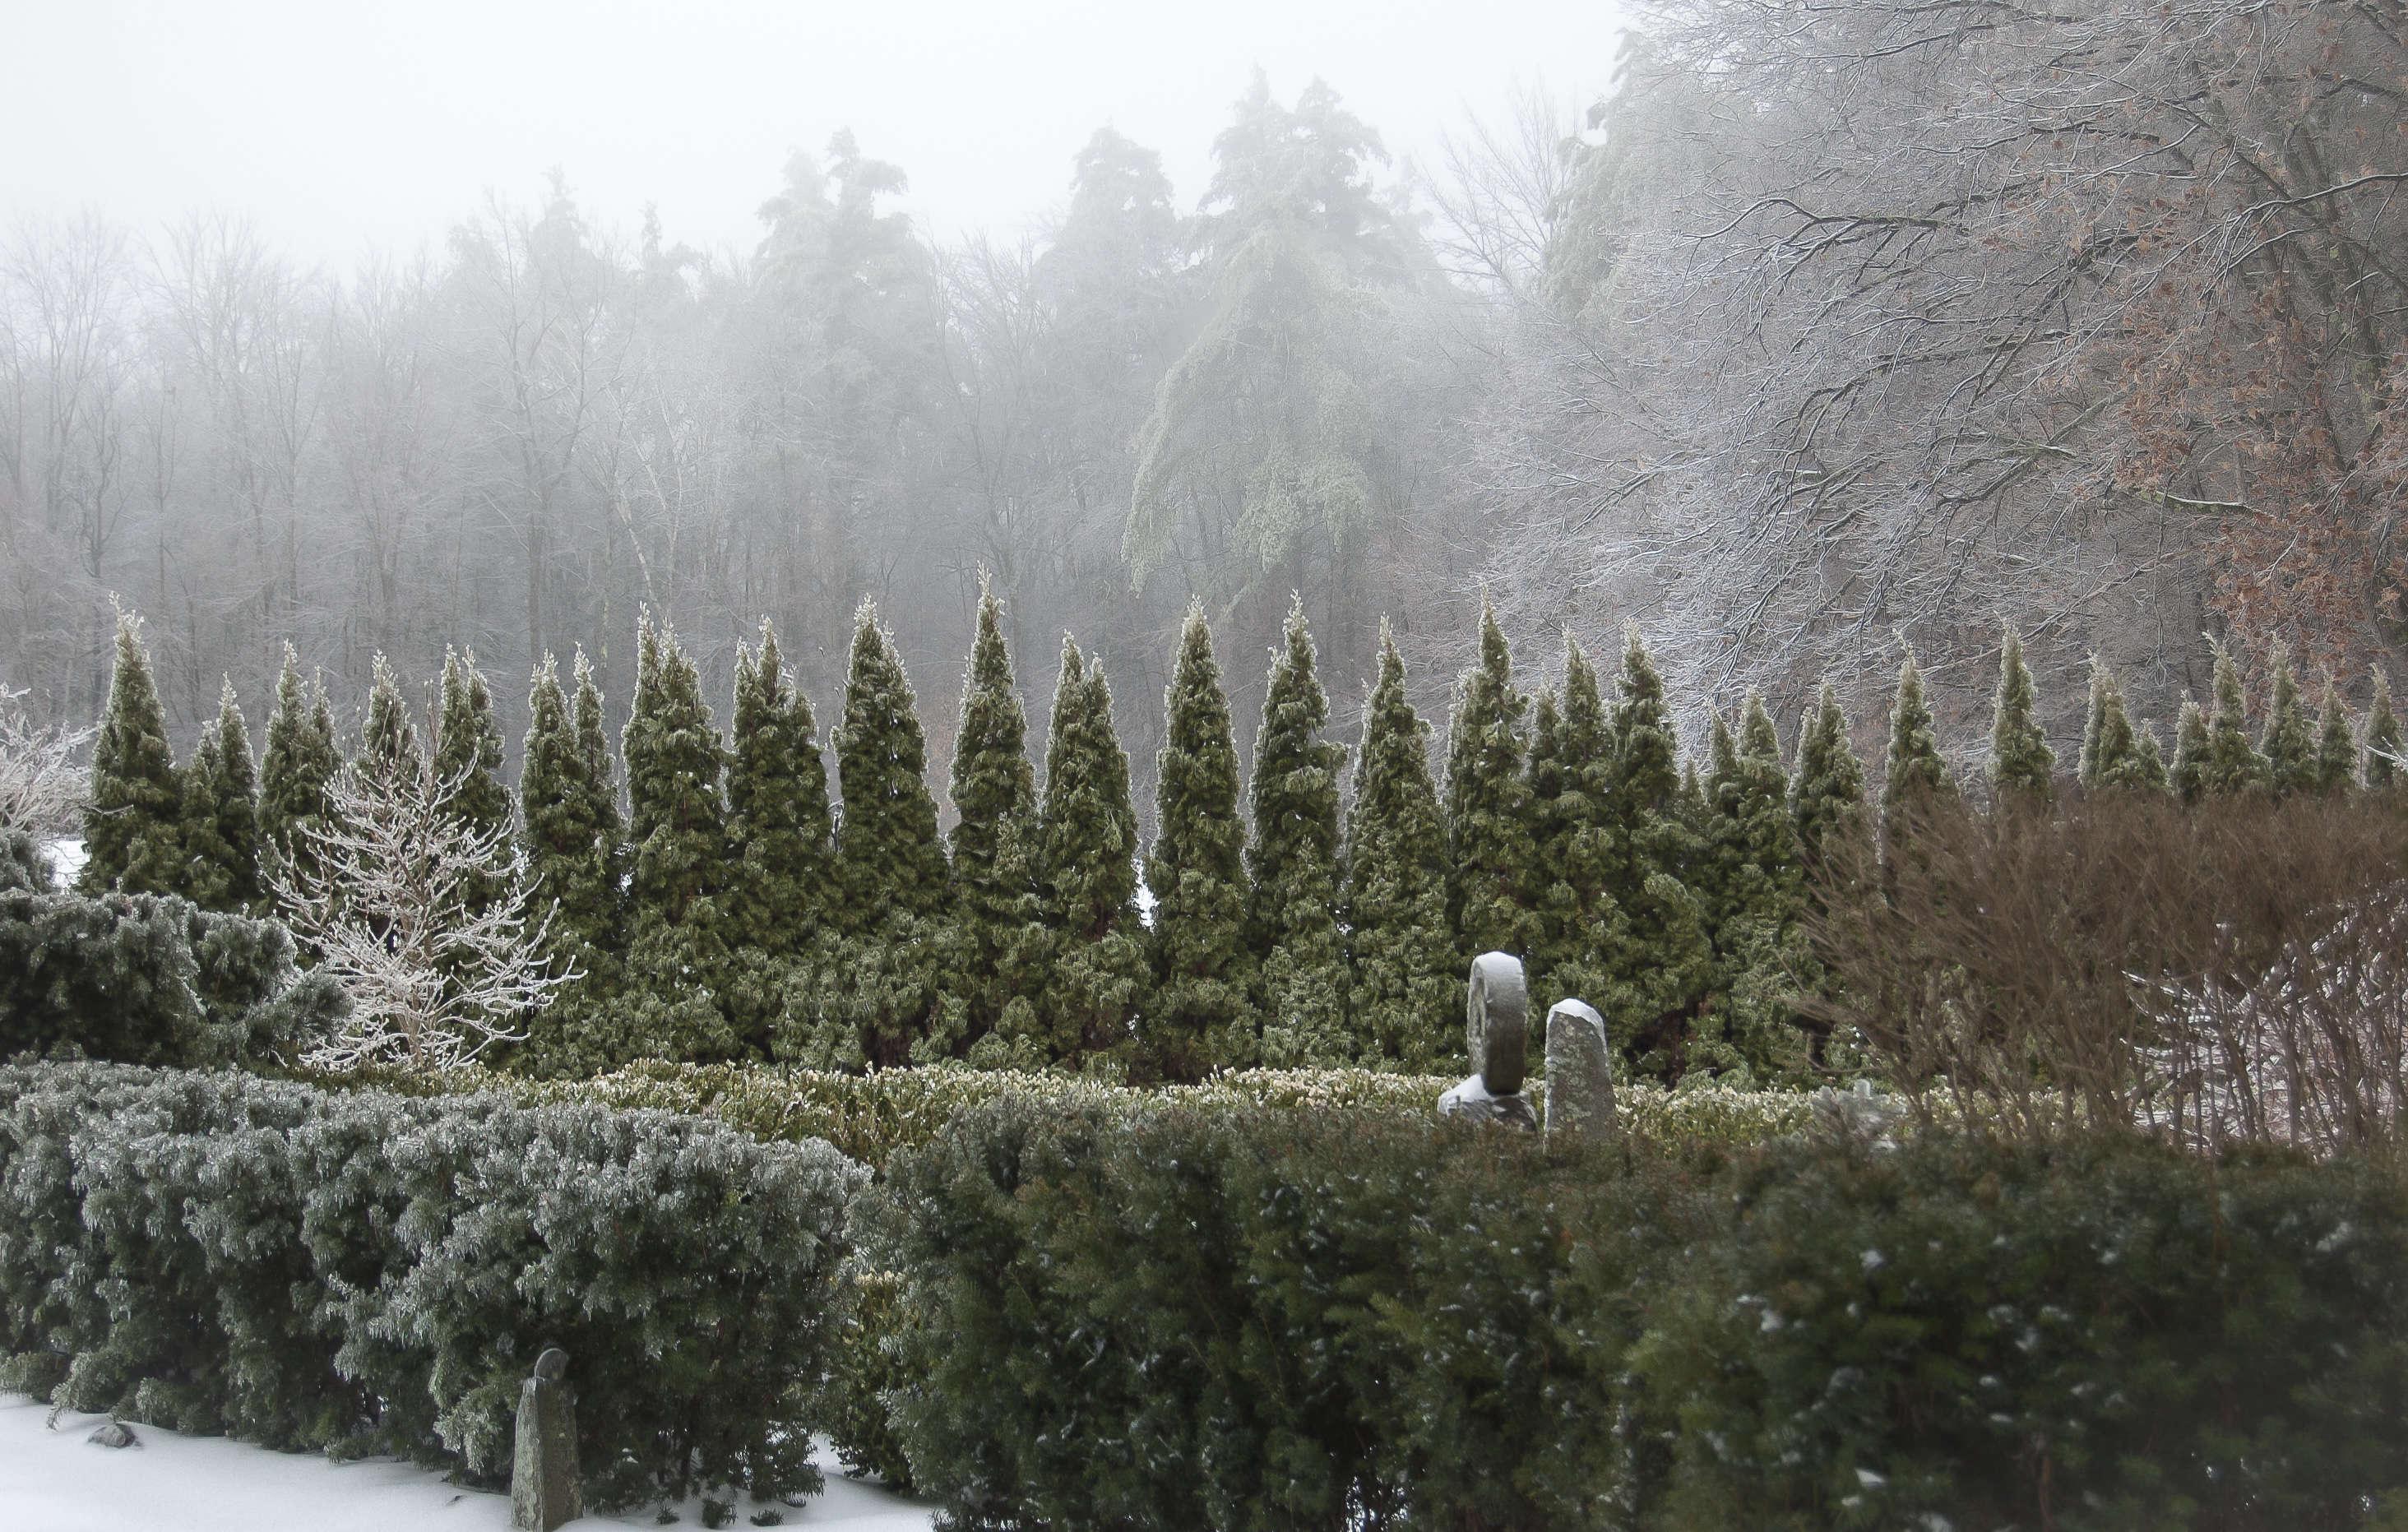 juniper-hill-winter-garden-hedge-joseph-valentine-8